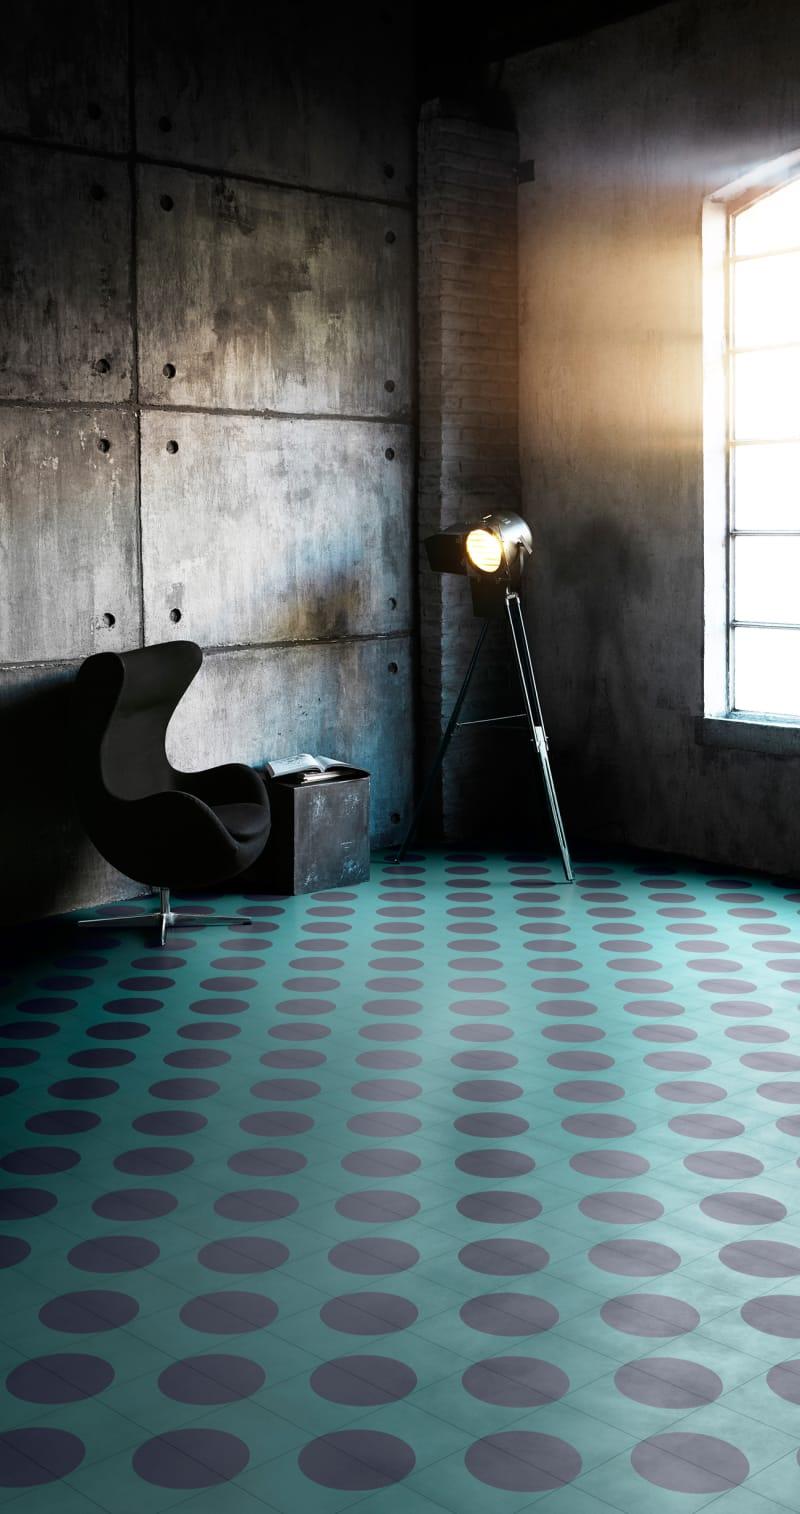 Bisazza-Cementiles_Dot-Design_design-INDIA-MAHDAVI